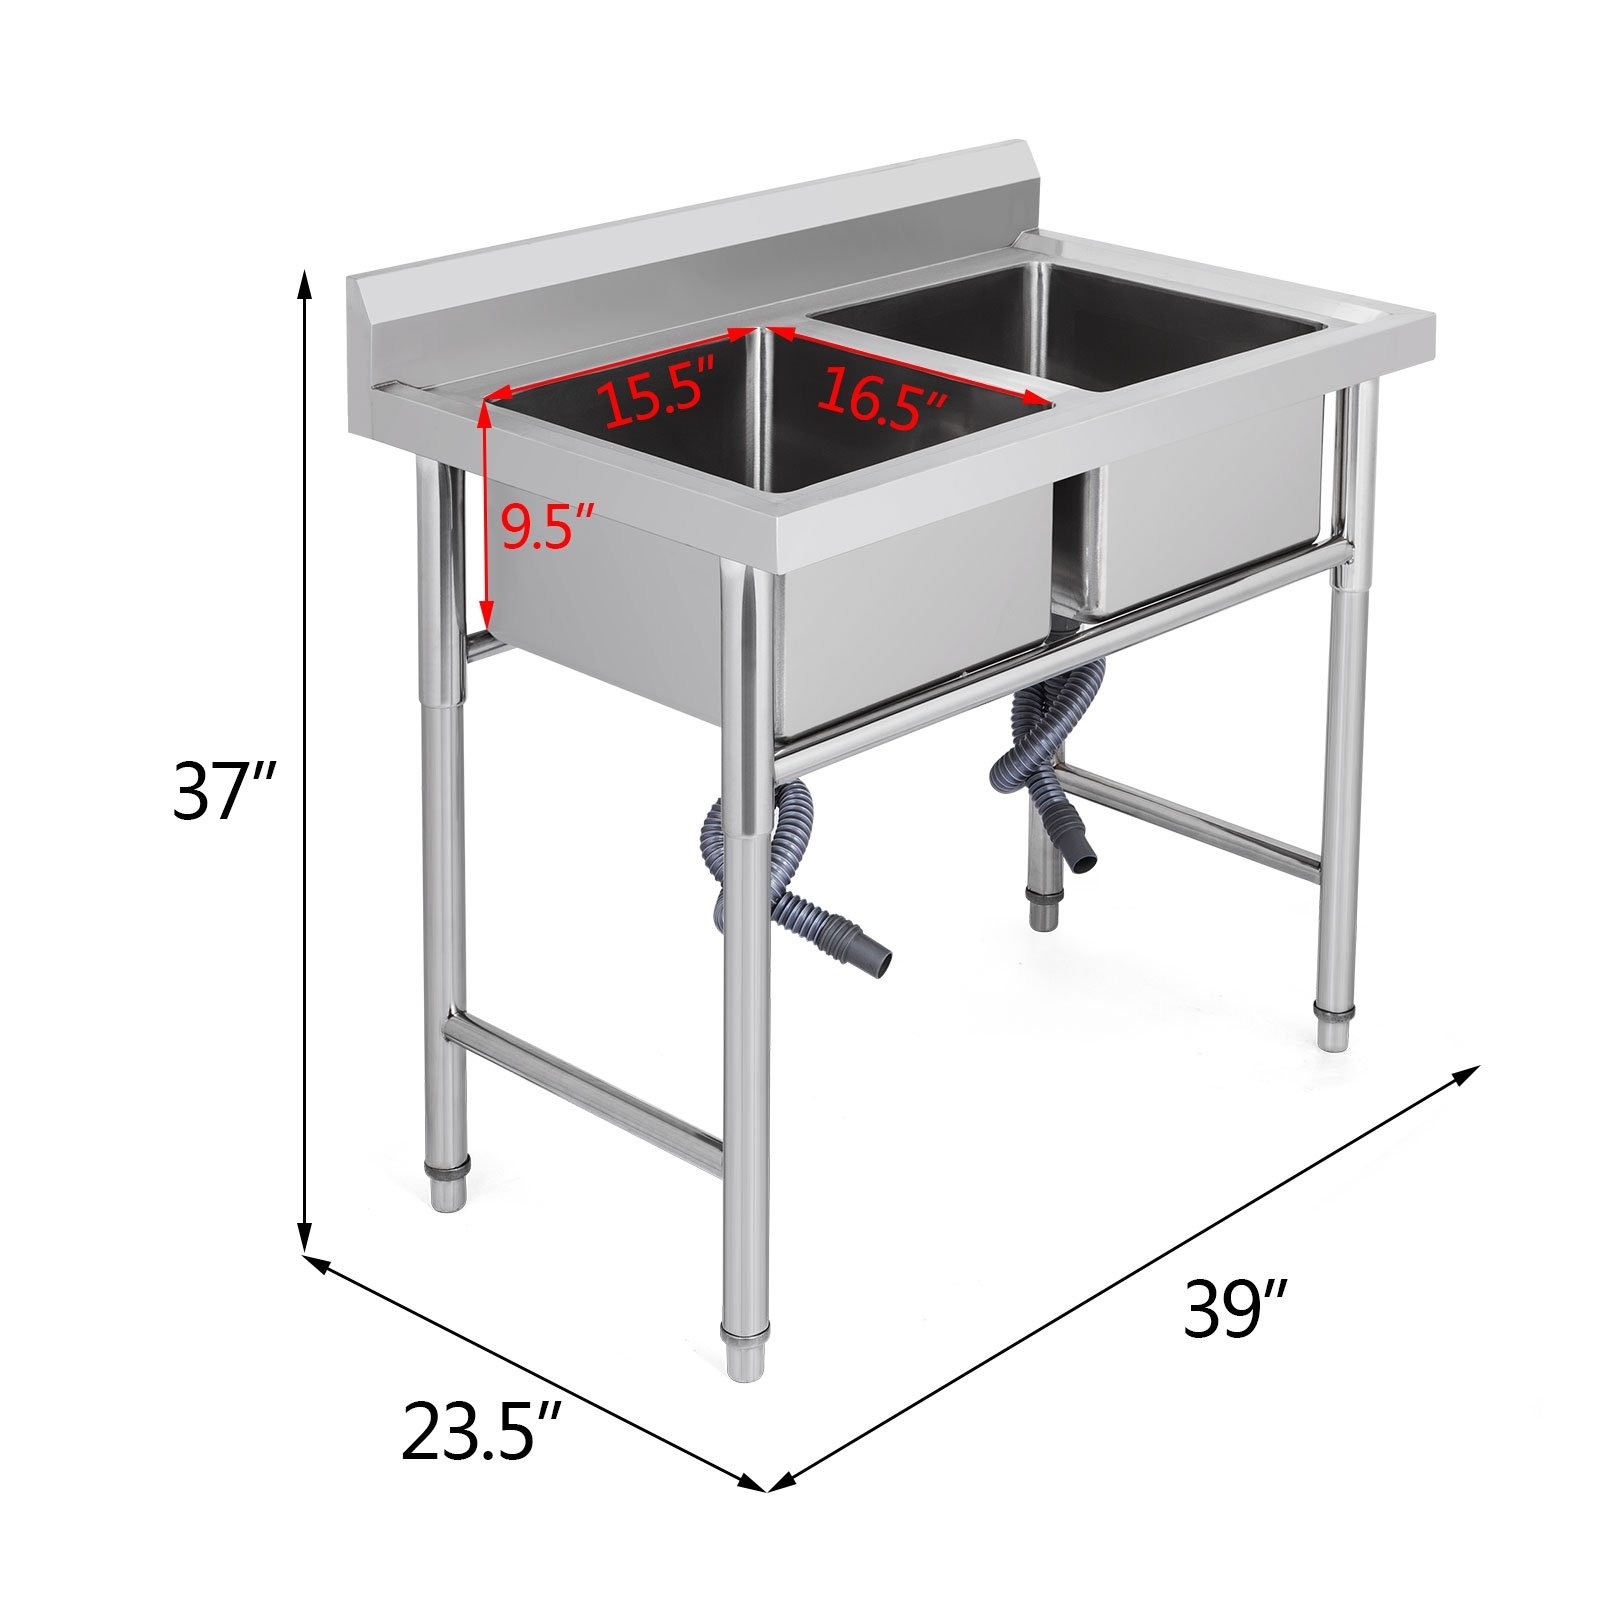 "Mophorn 2 Compartment Stainless Steel Bar Sink 15.5"" x 16.5""Bowl Size Handmade Underbar Sink for bar, kitchen restaurant by Mophorn (Image #2)"